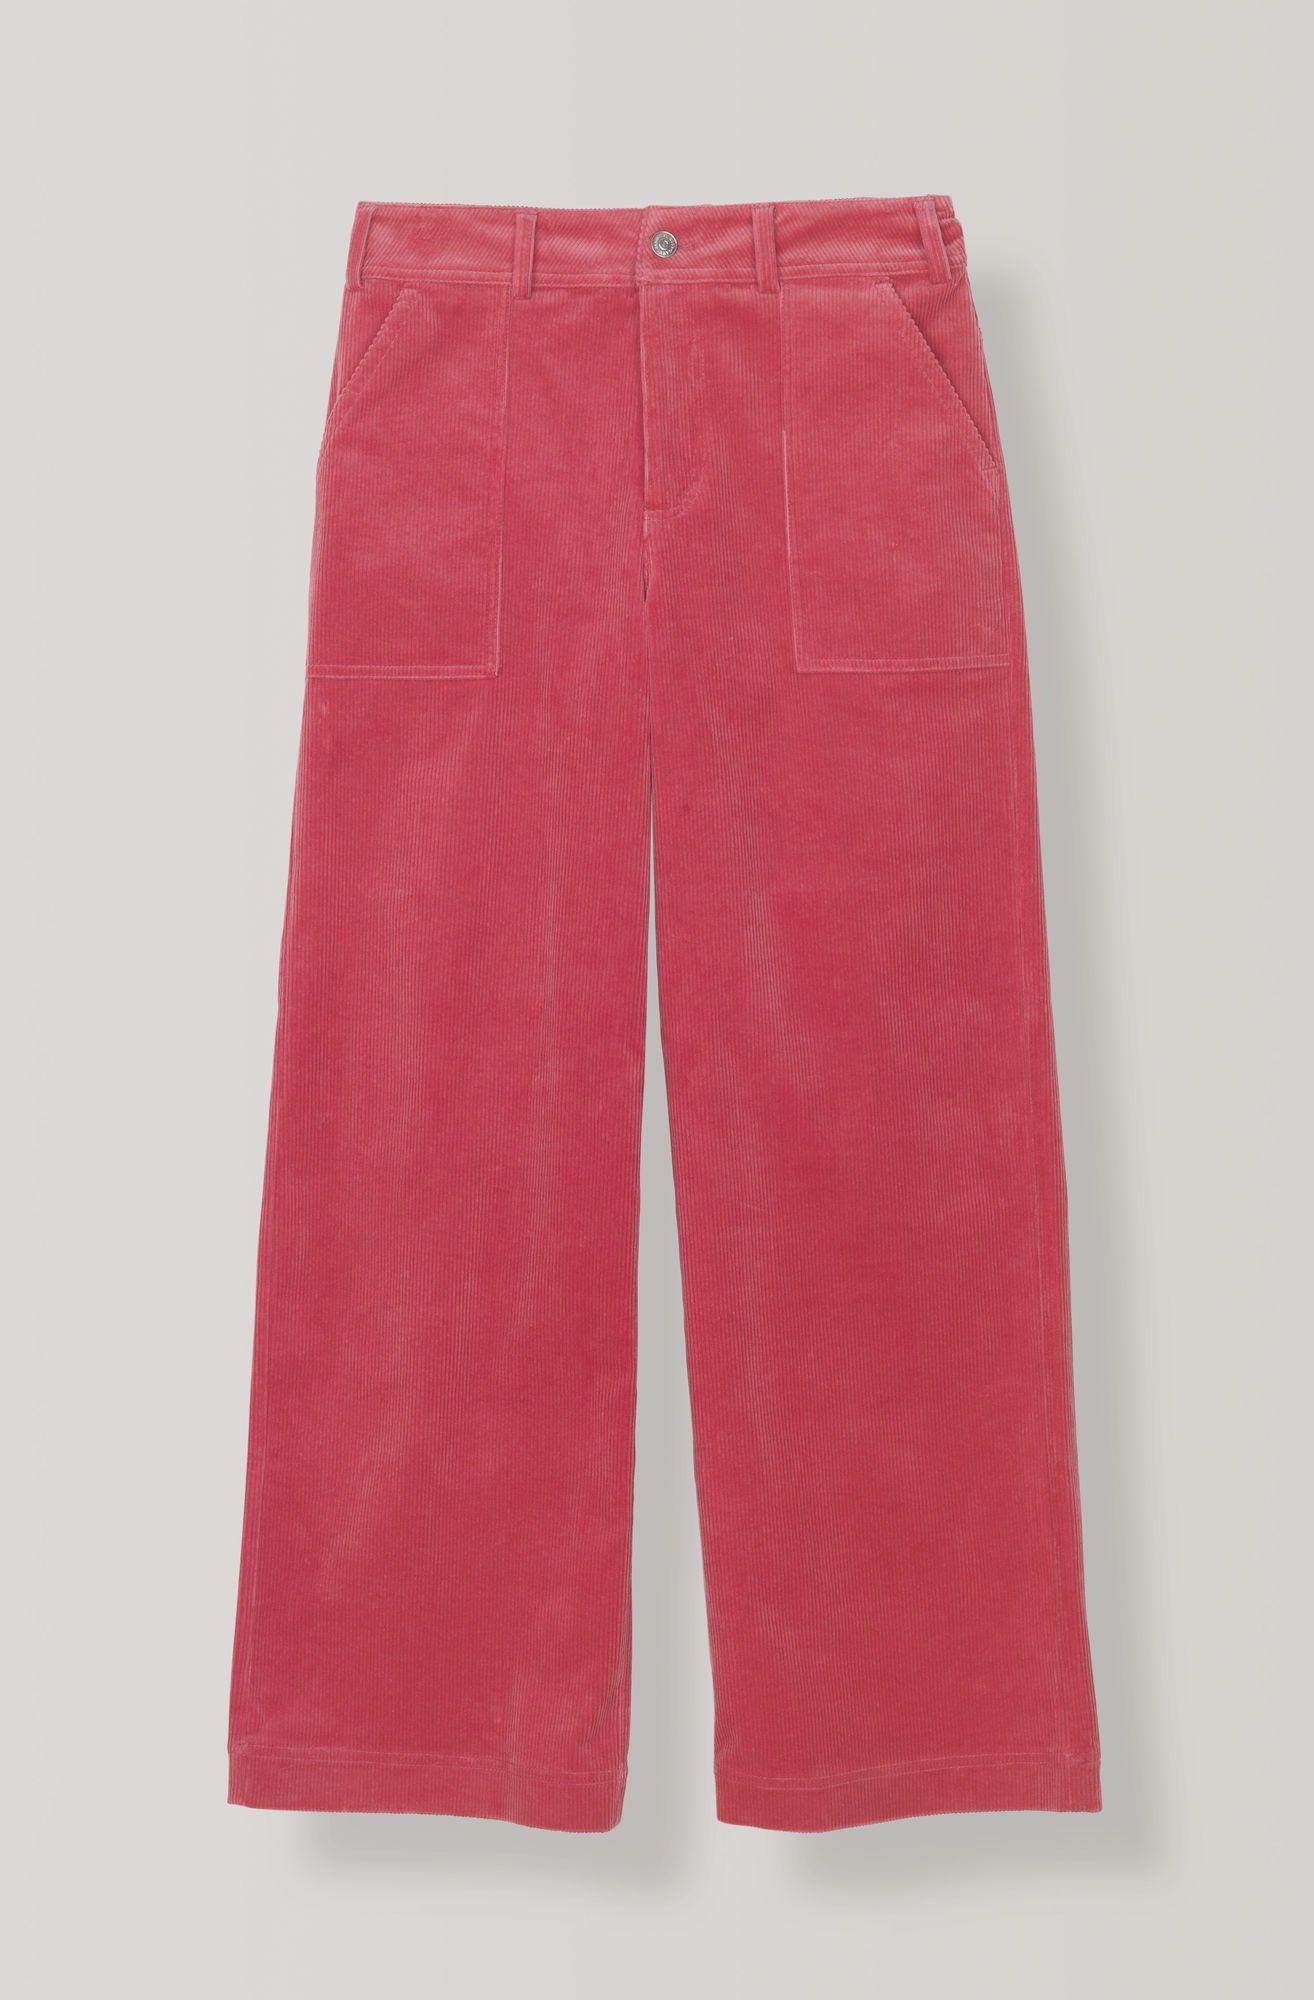 822f2c3bb1c2 Pink